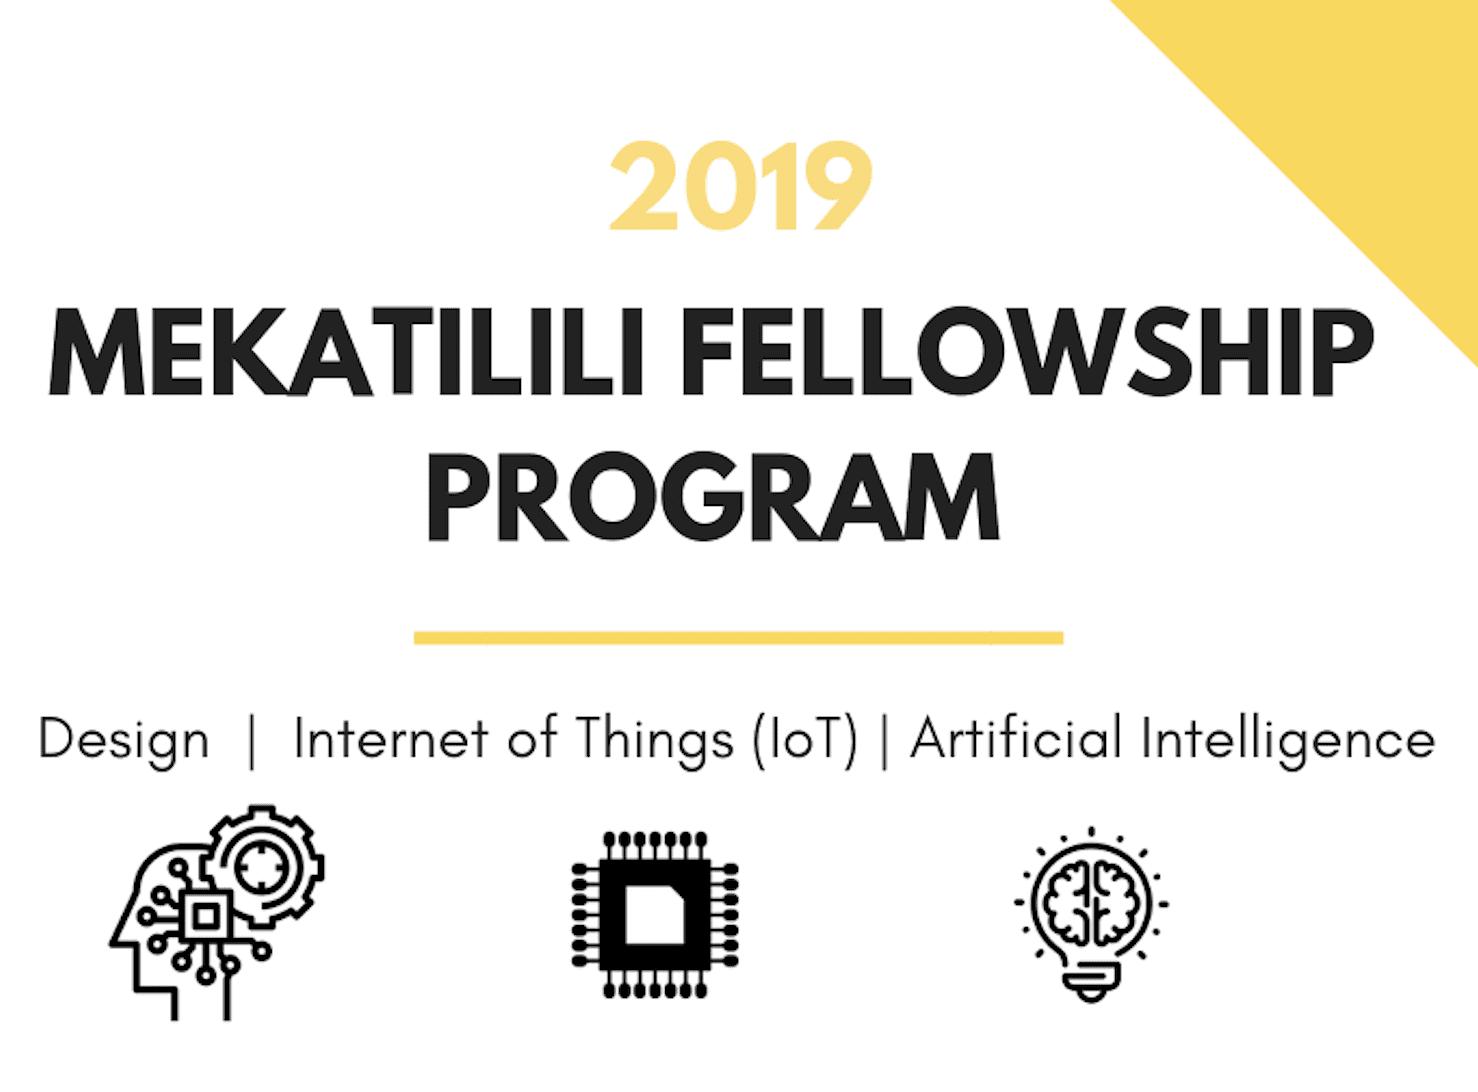 The Mekatilili Fellowship Program (MFP) 2019 for innovative